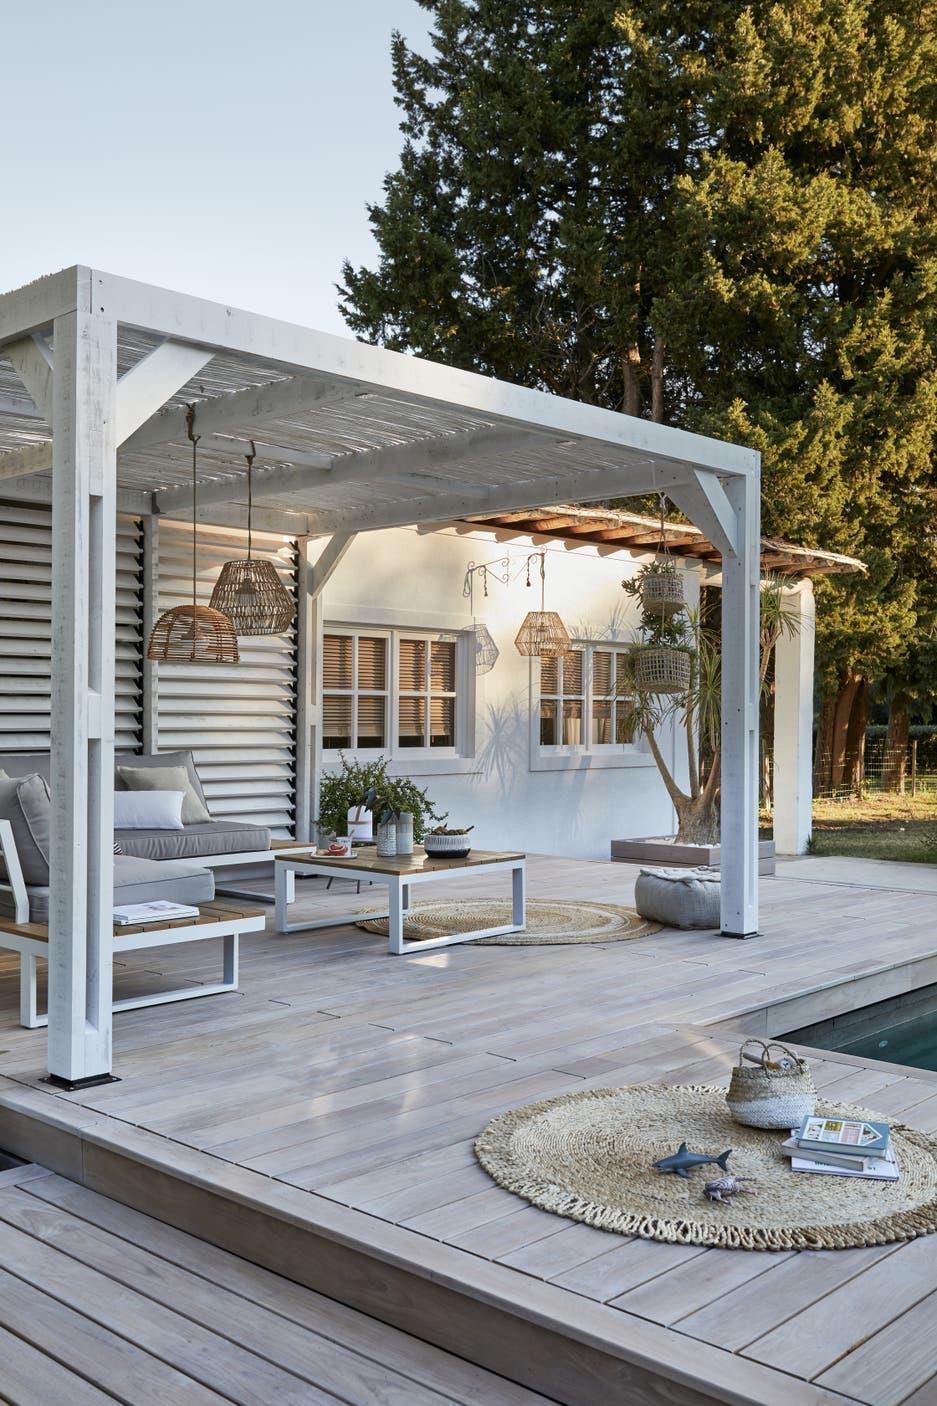 Une terrasse en bois avec pergola au bord de la piscine   Leroy Merlin